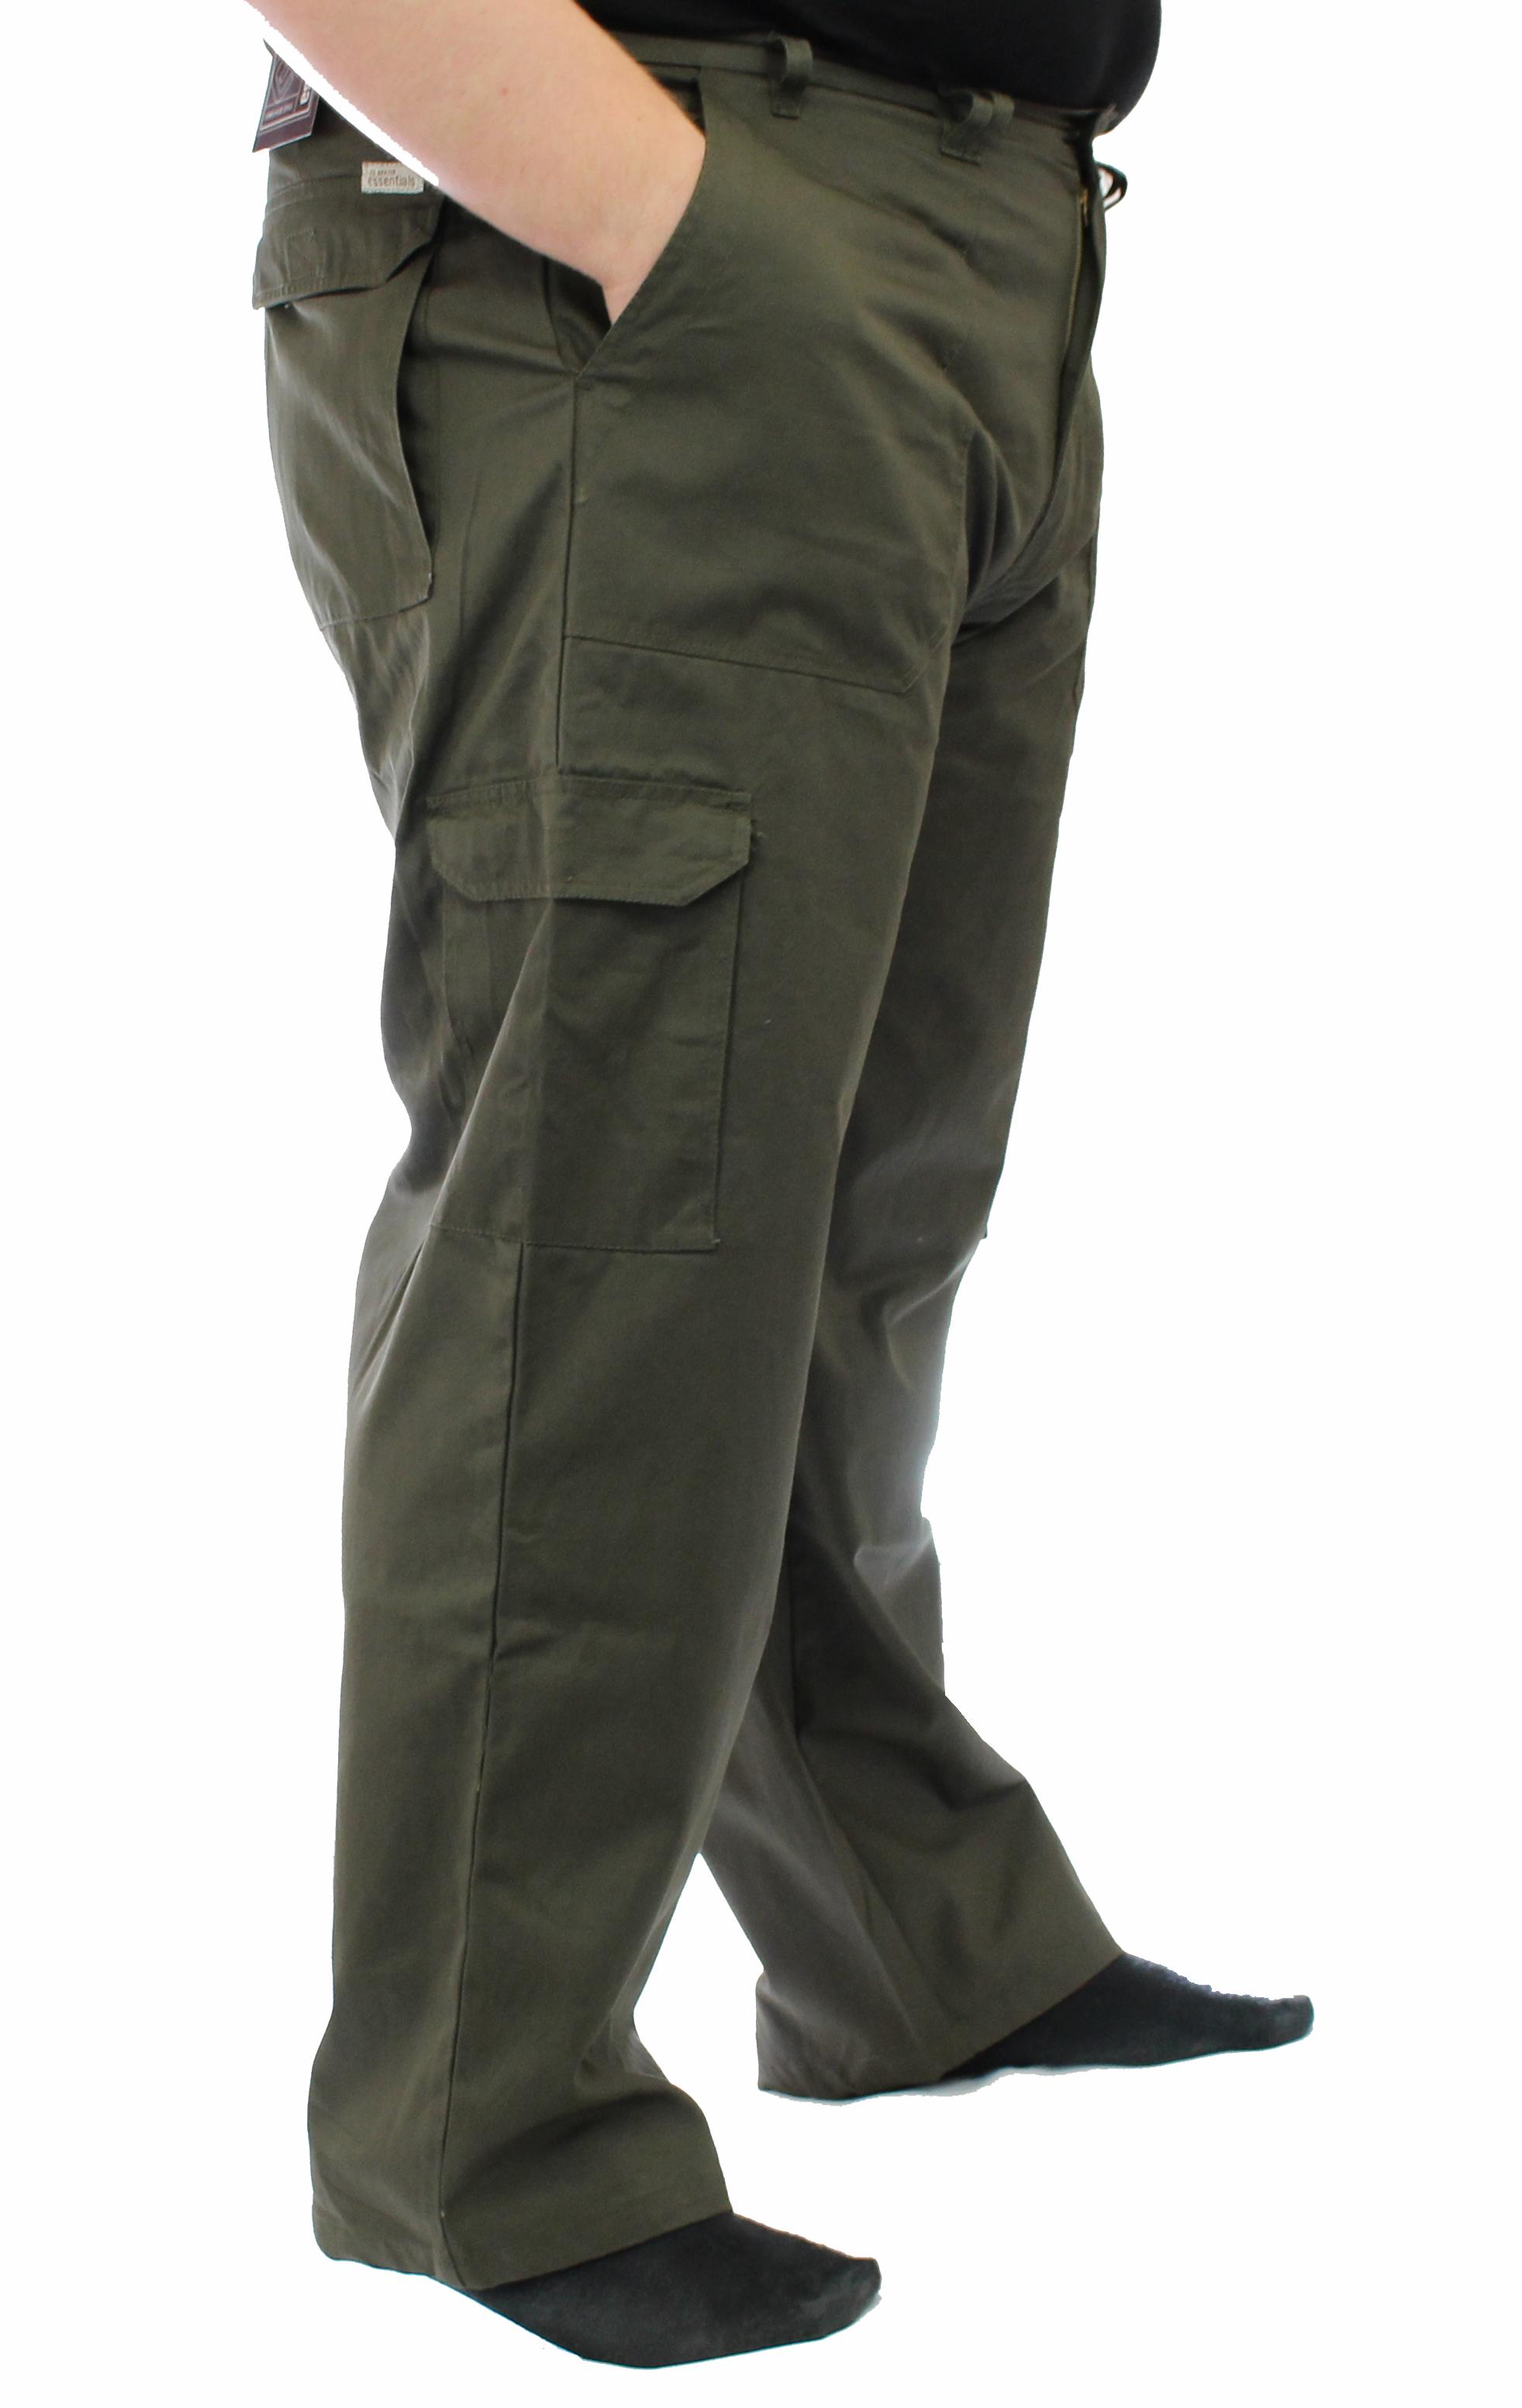 "Ed Baxter Victory - Heavy Duty Cargo Combat Trousers - Khaki - 44"" Waist, 34"" Leg"